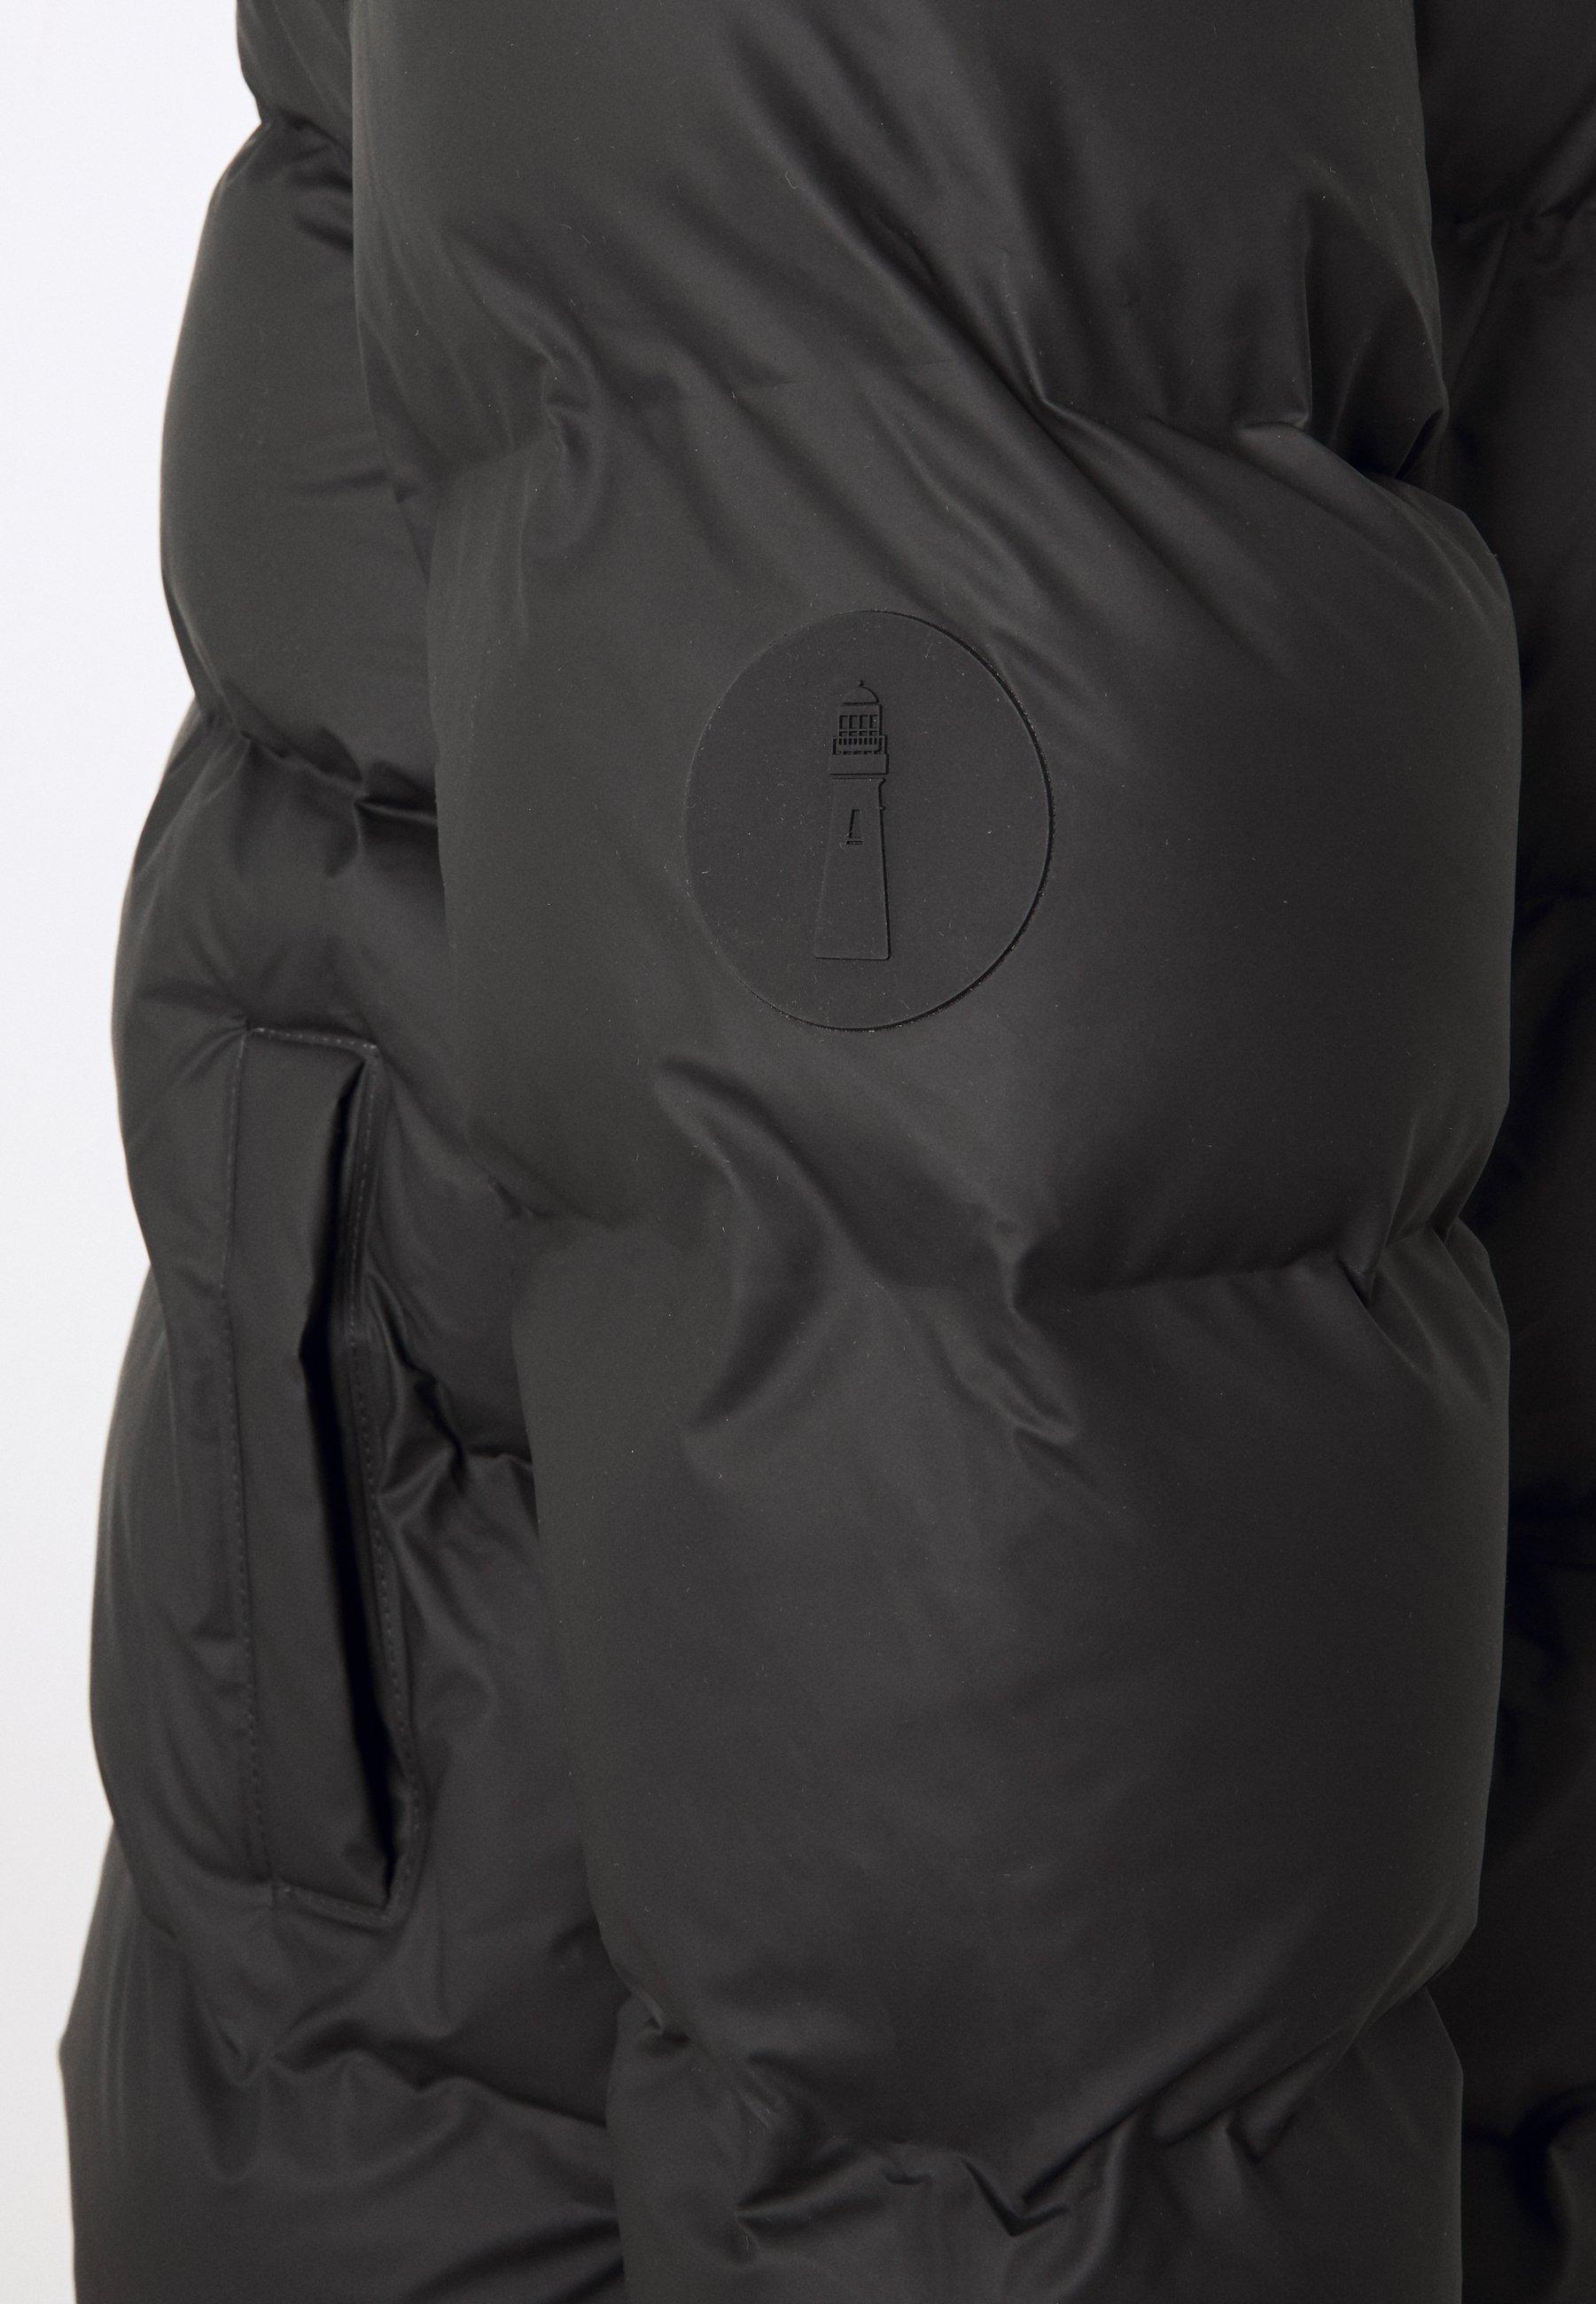 Particular Discount Women's Clothing Rains PUFFER JACKET Winter jacket black ikTJ1HJJ1